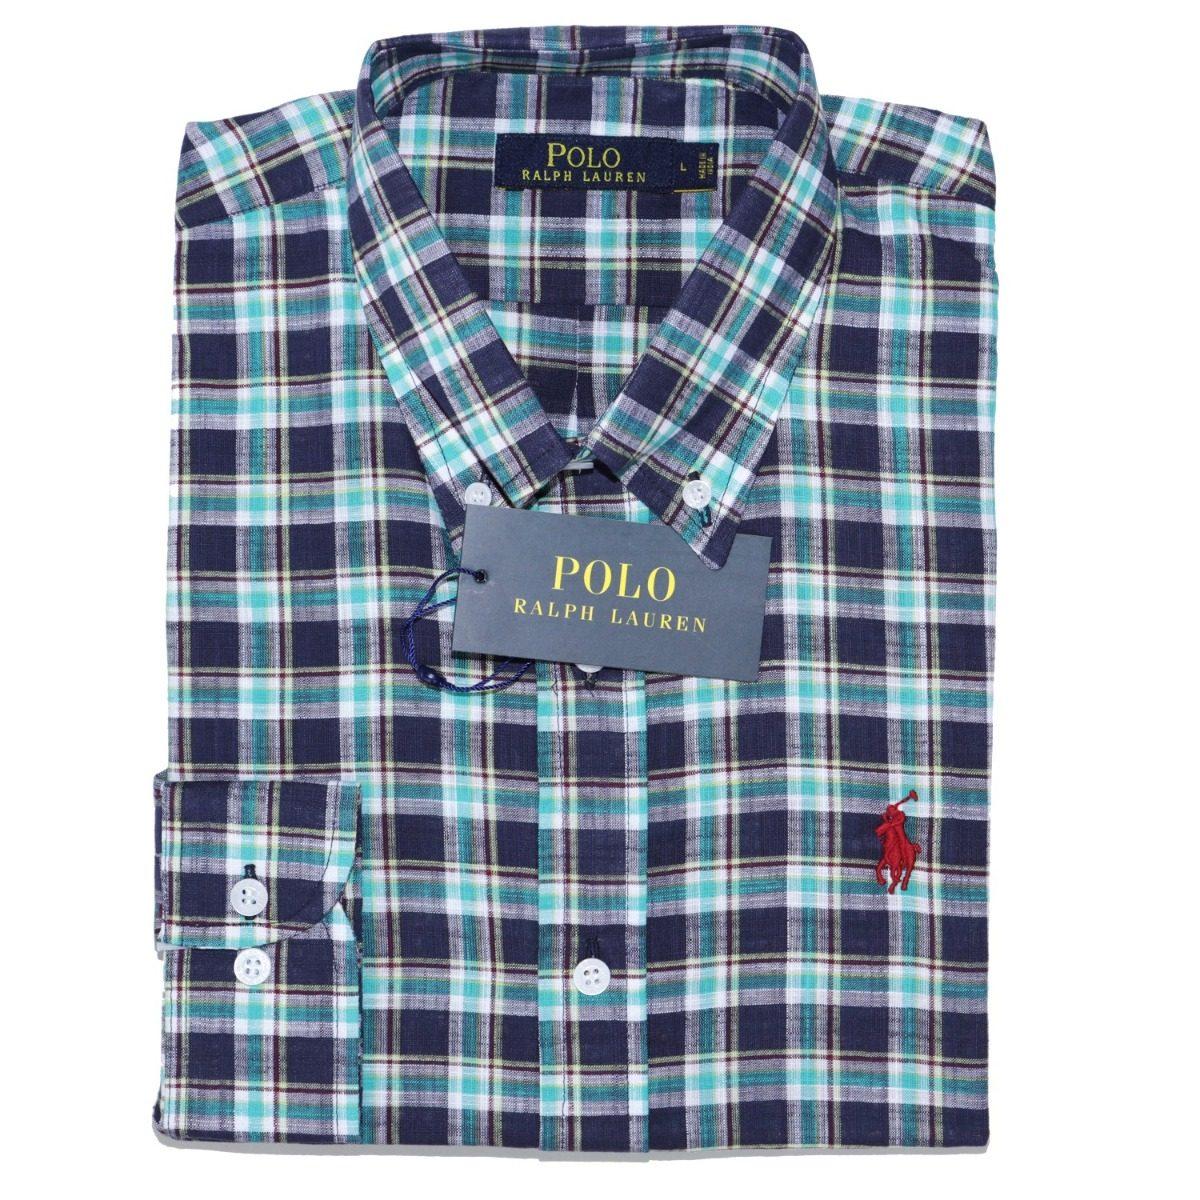 camisa social ralph lauren masc linho xadrez verde original. Carregando  zoom. 054f46b06f9